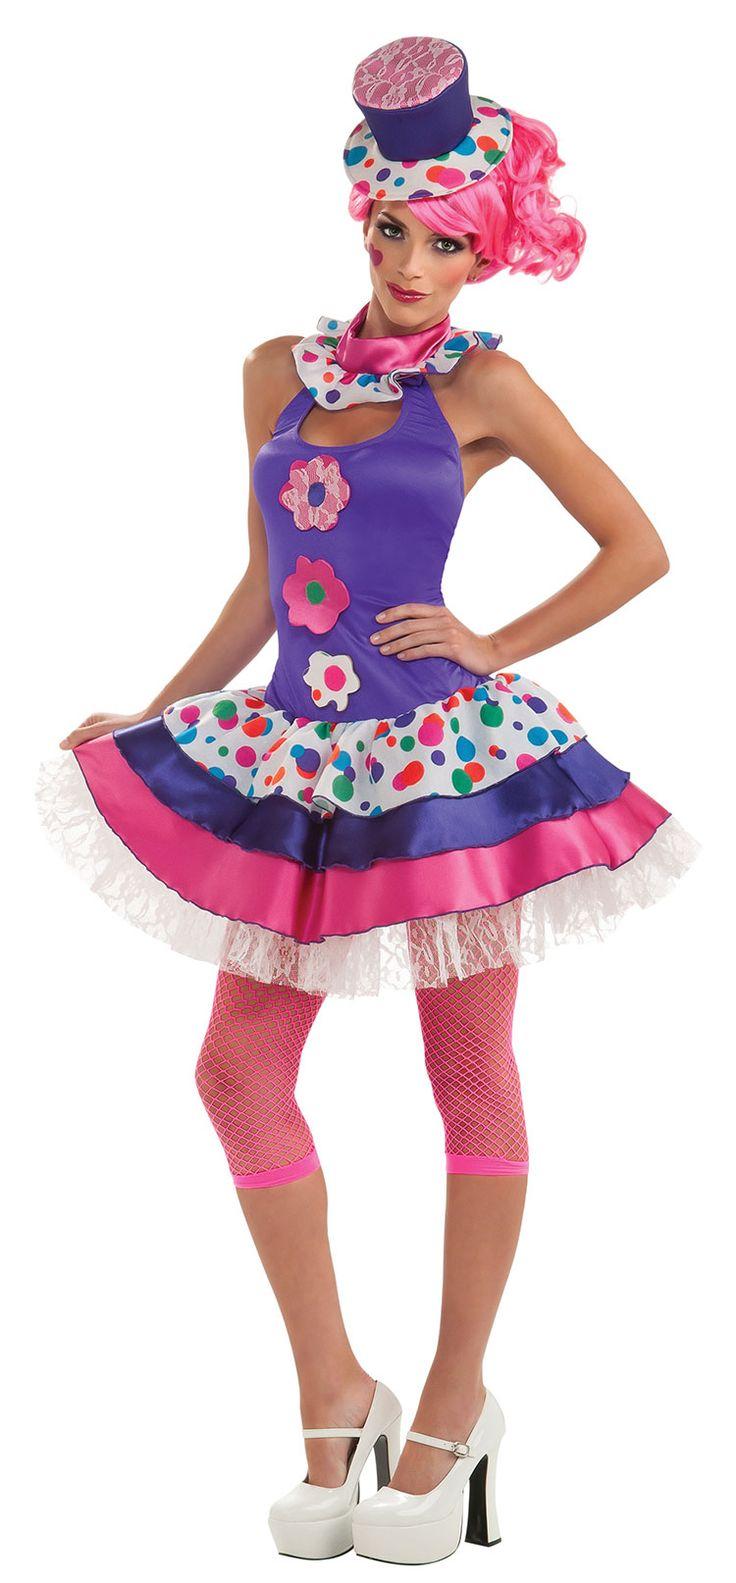 Jellybean Clown Costume